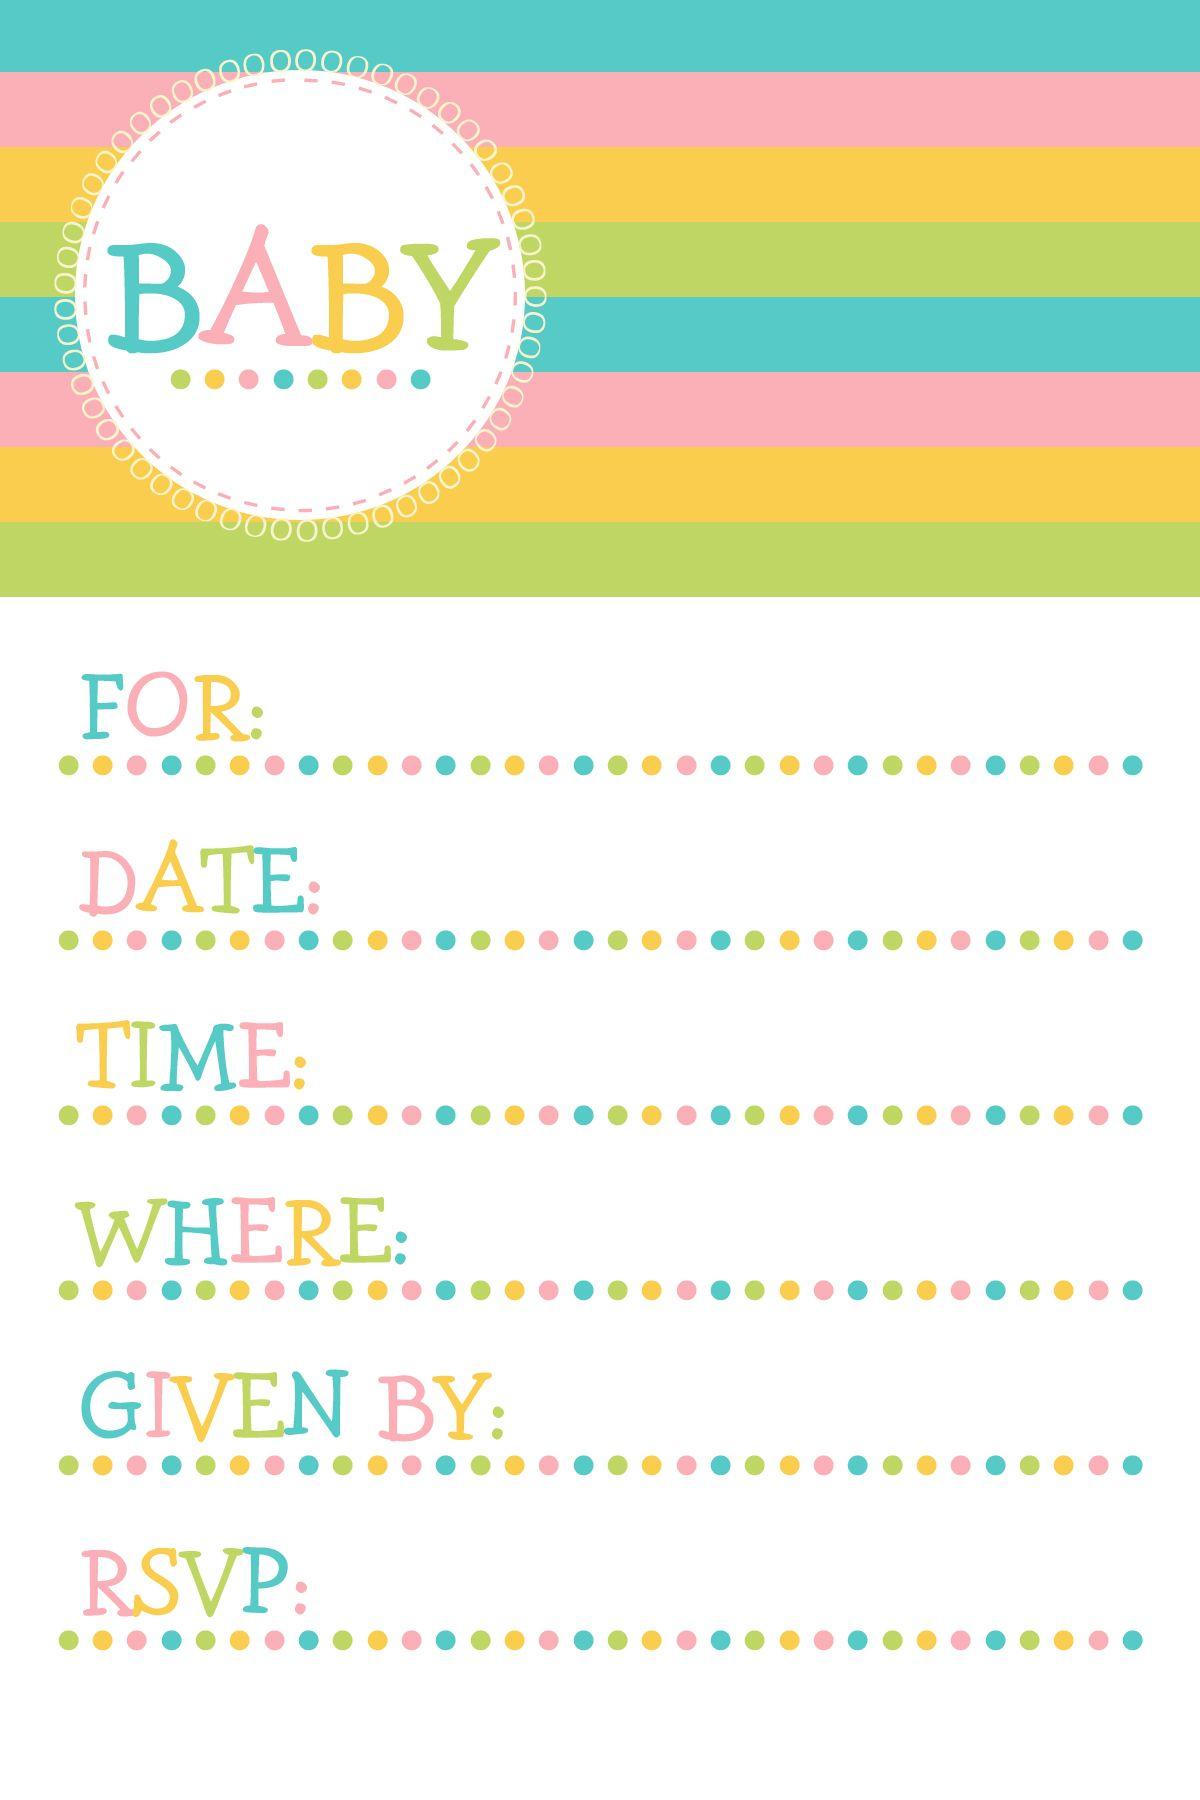 Free Printable Baby Shower Invitations | Cupcake Clipart | Boy Baby - Free Printable Baby Shower Invitation Maker